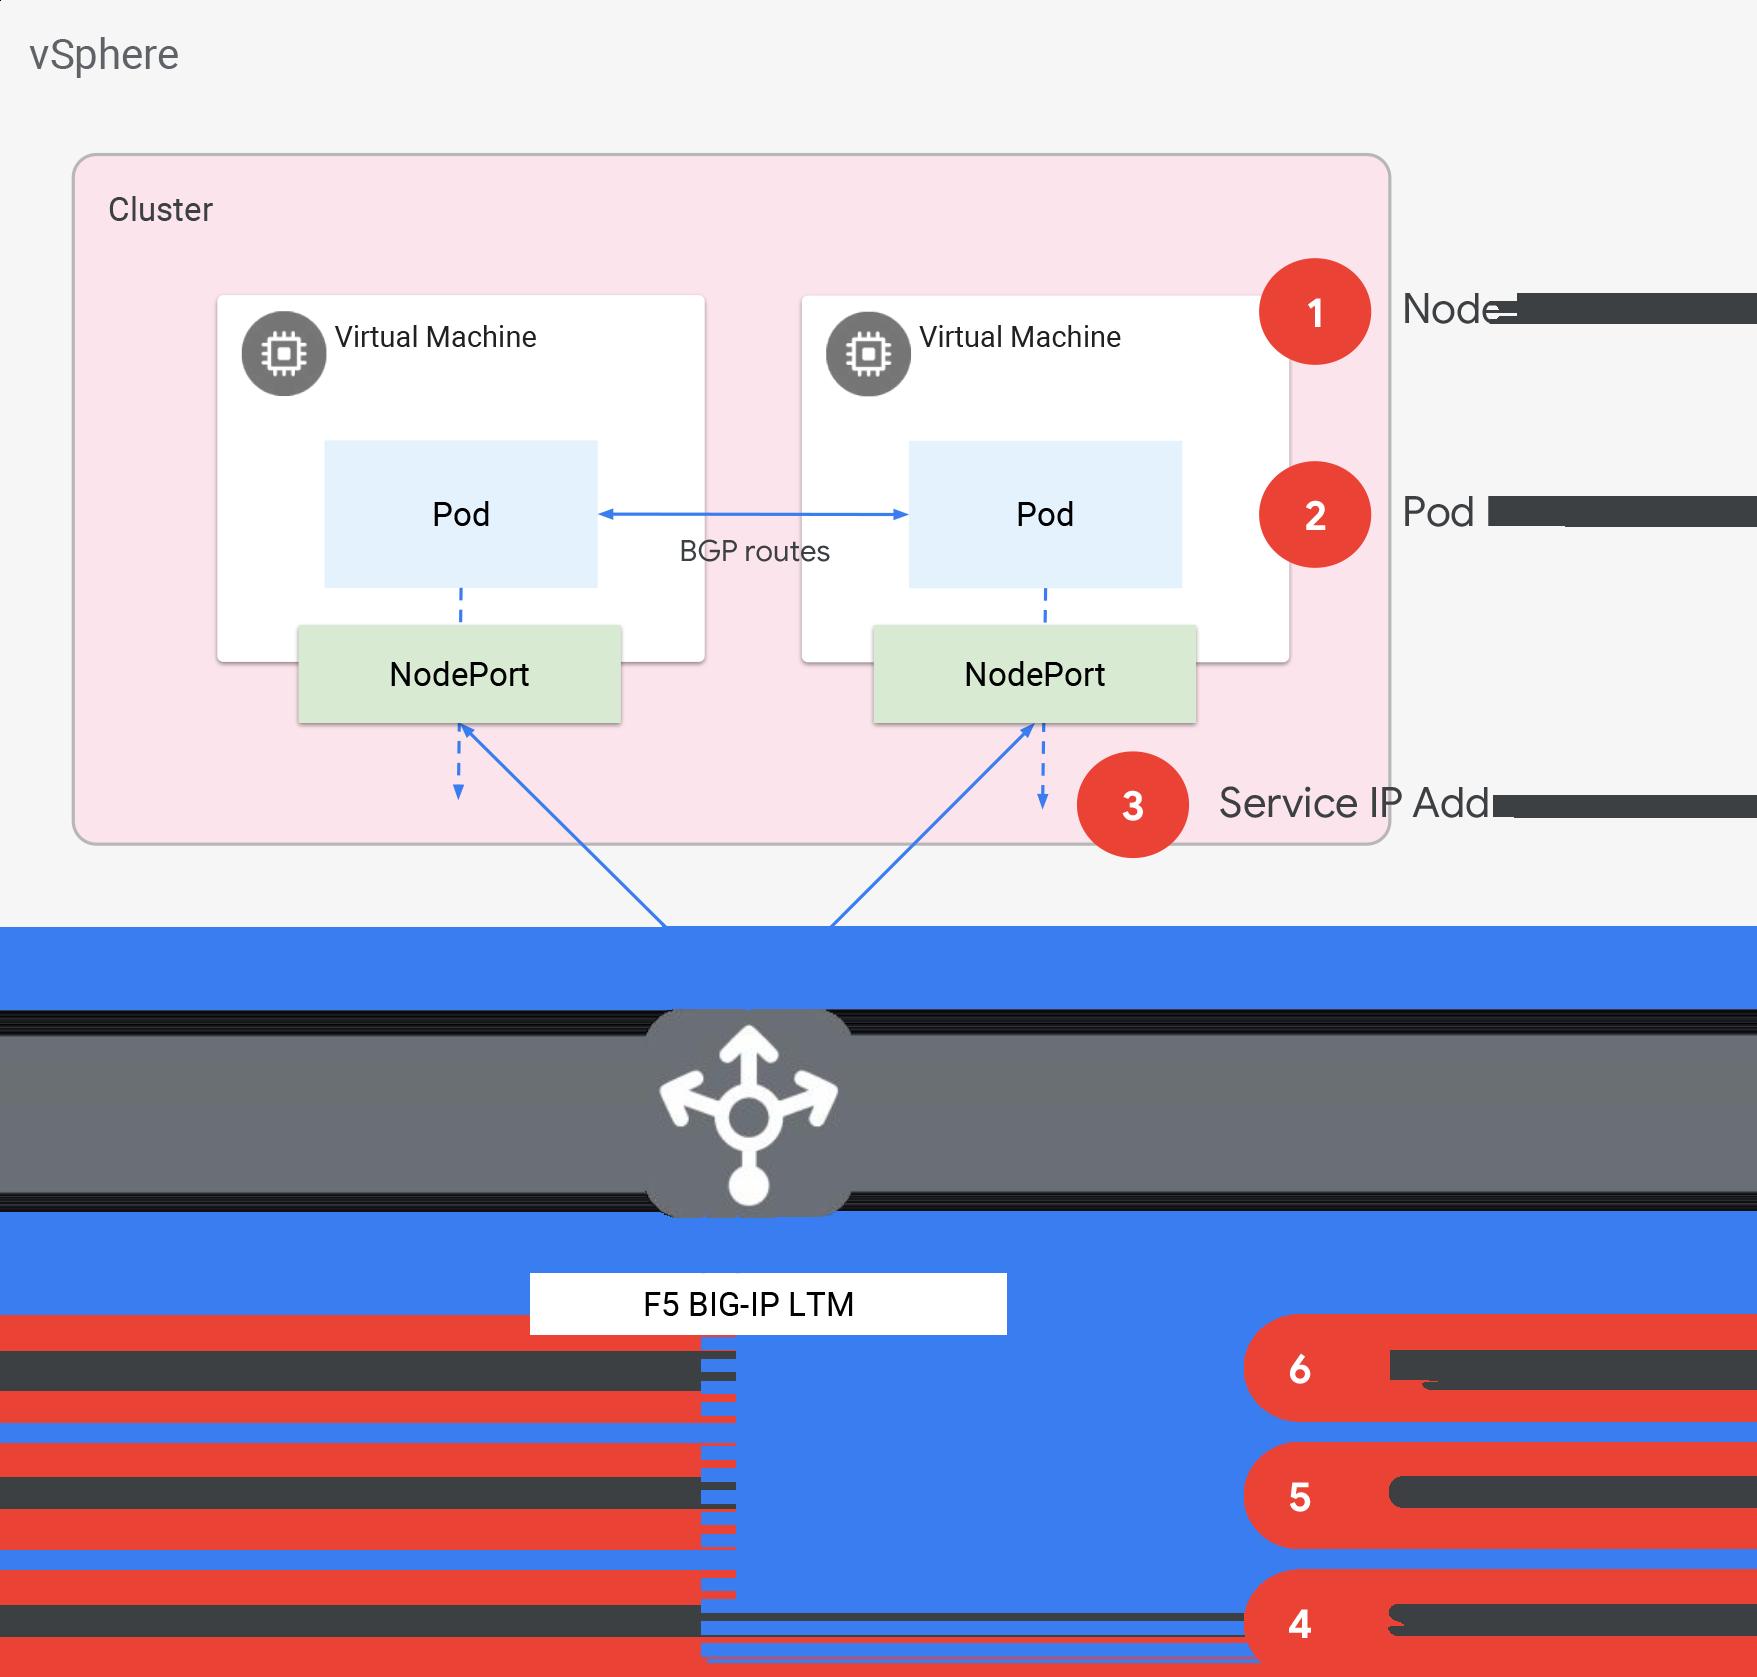 Diagram describing Anthos clusters on VMware architecture